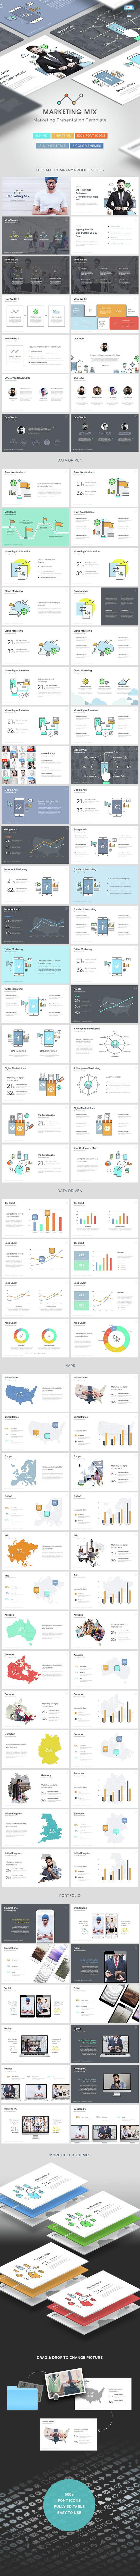 Social Media Mix - Creative Keynote Template - Keynote Templates Presentation Templates